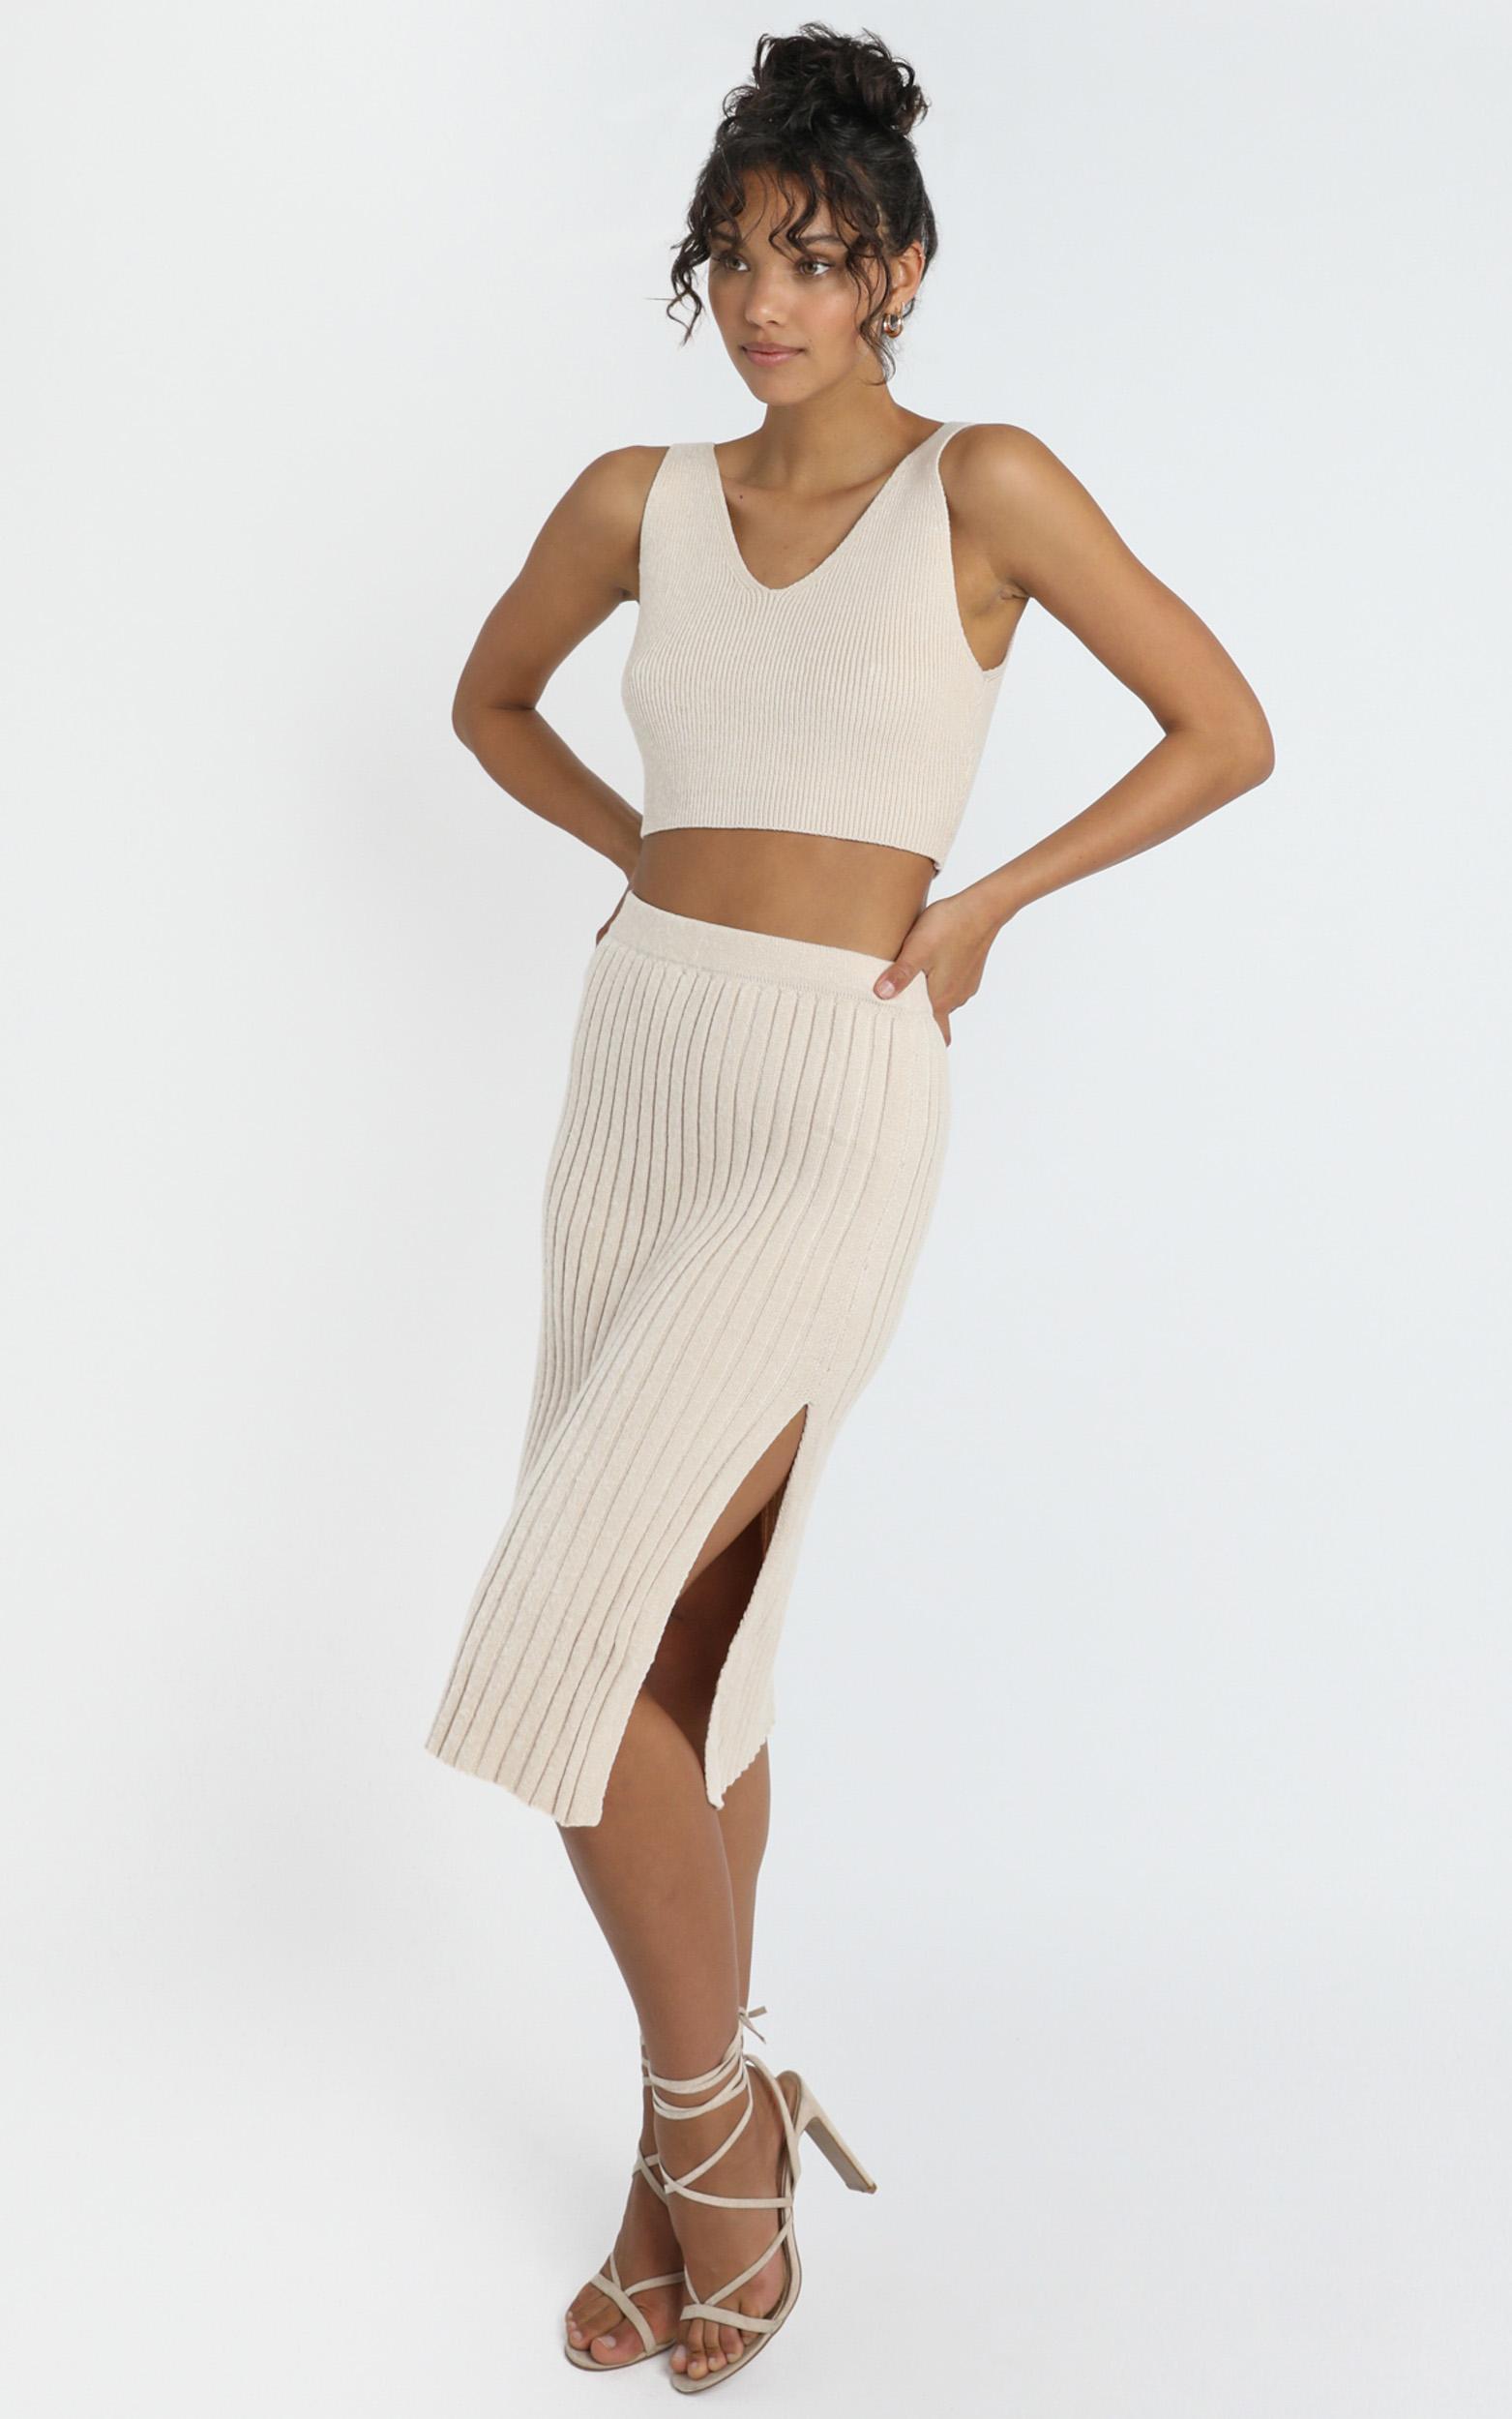 Yana Knit Skirt in Beige - 8 (S), Beige, hi-res image number null